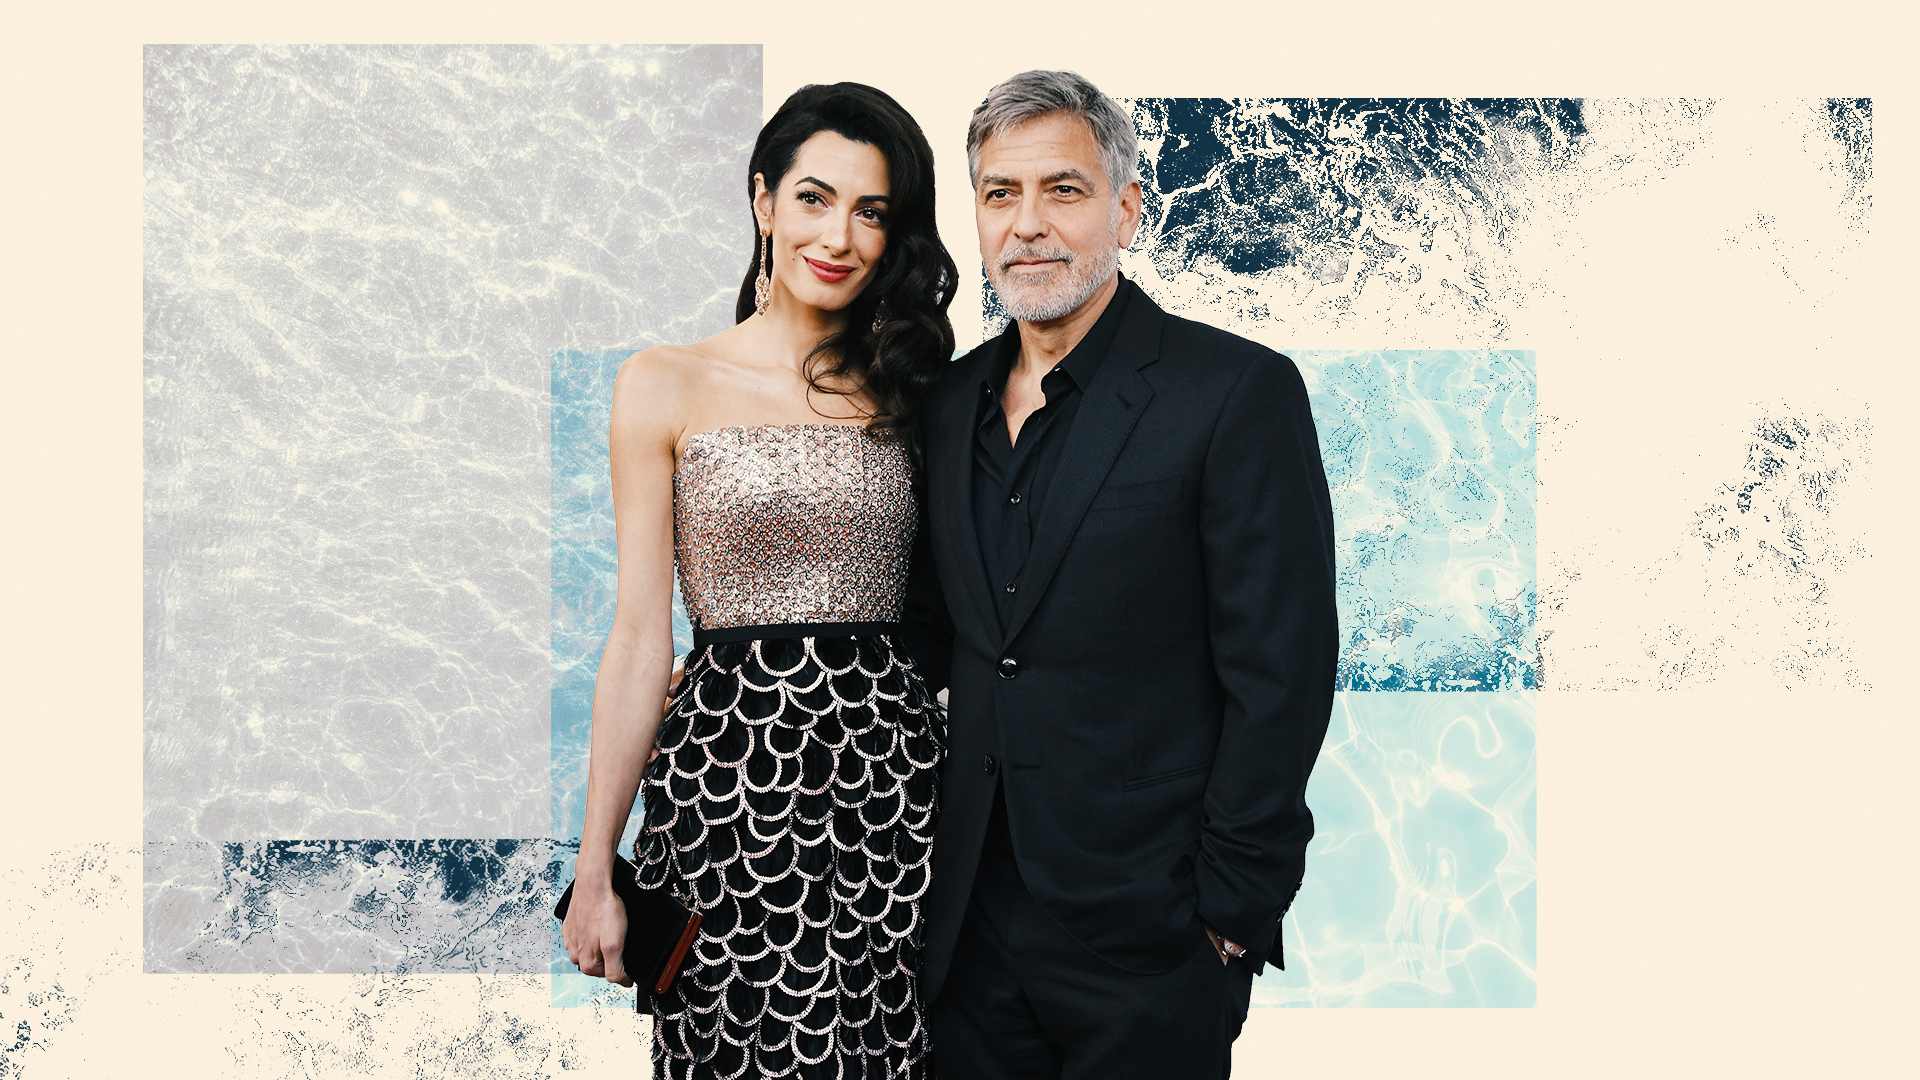 Get to Know 3-Year-Old Ella & Alexander Clooney